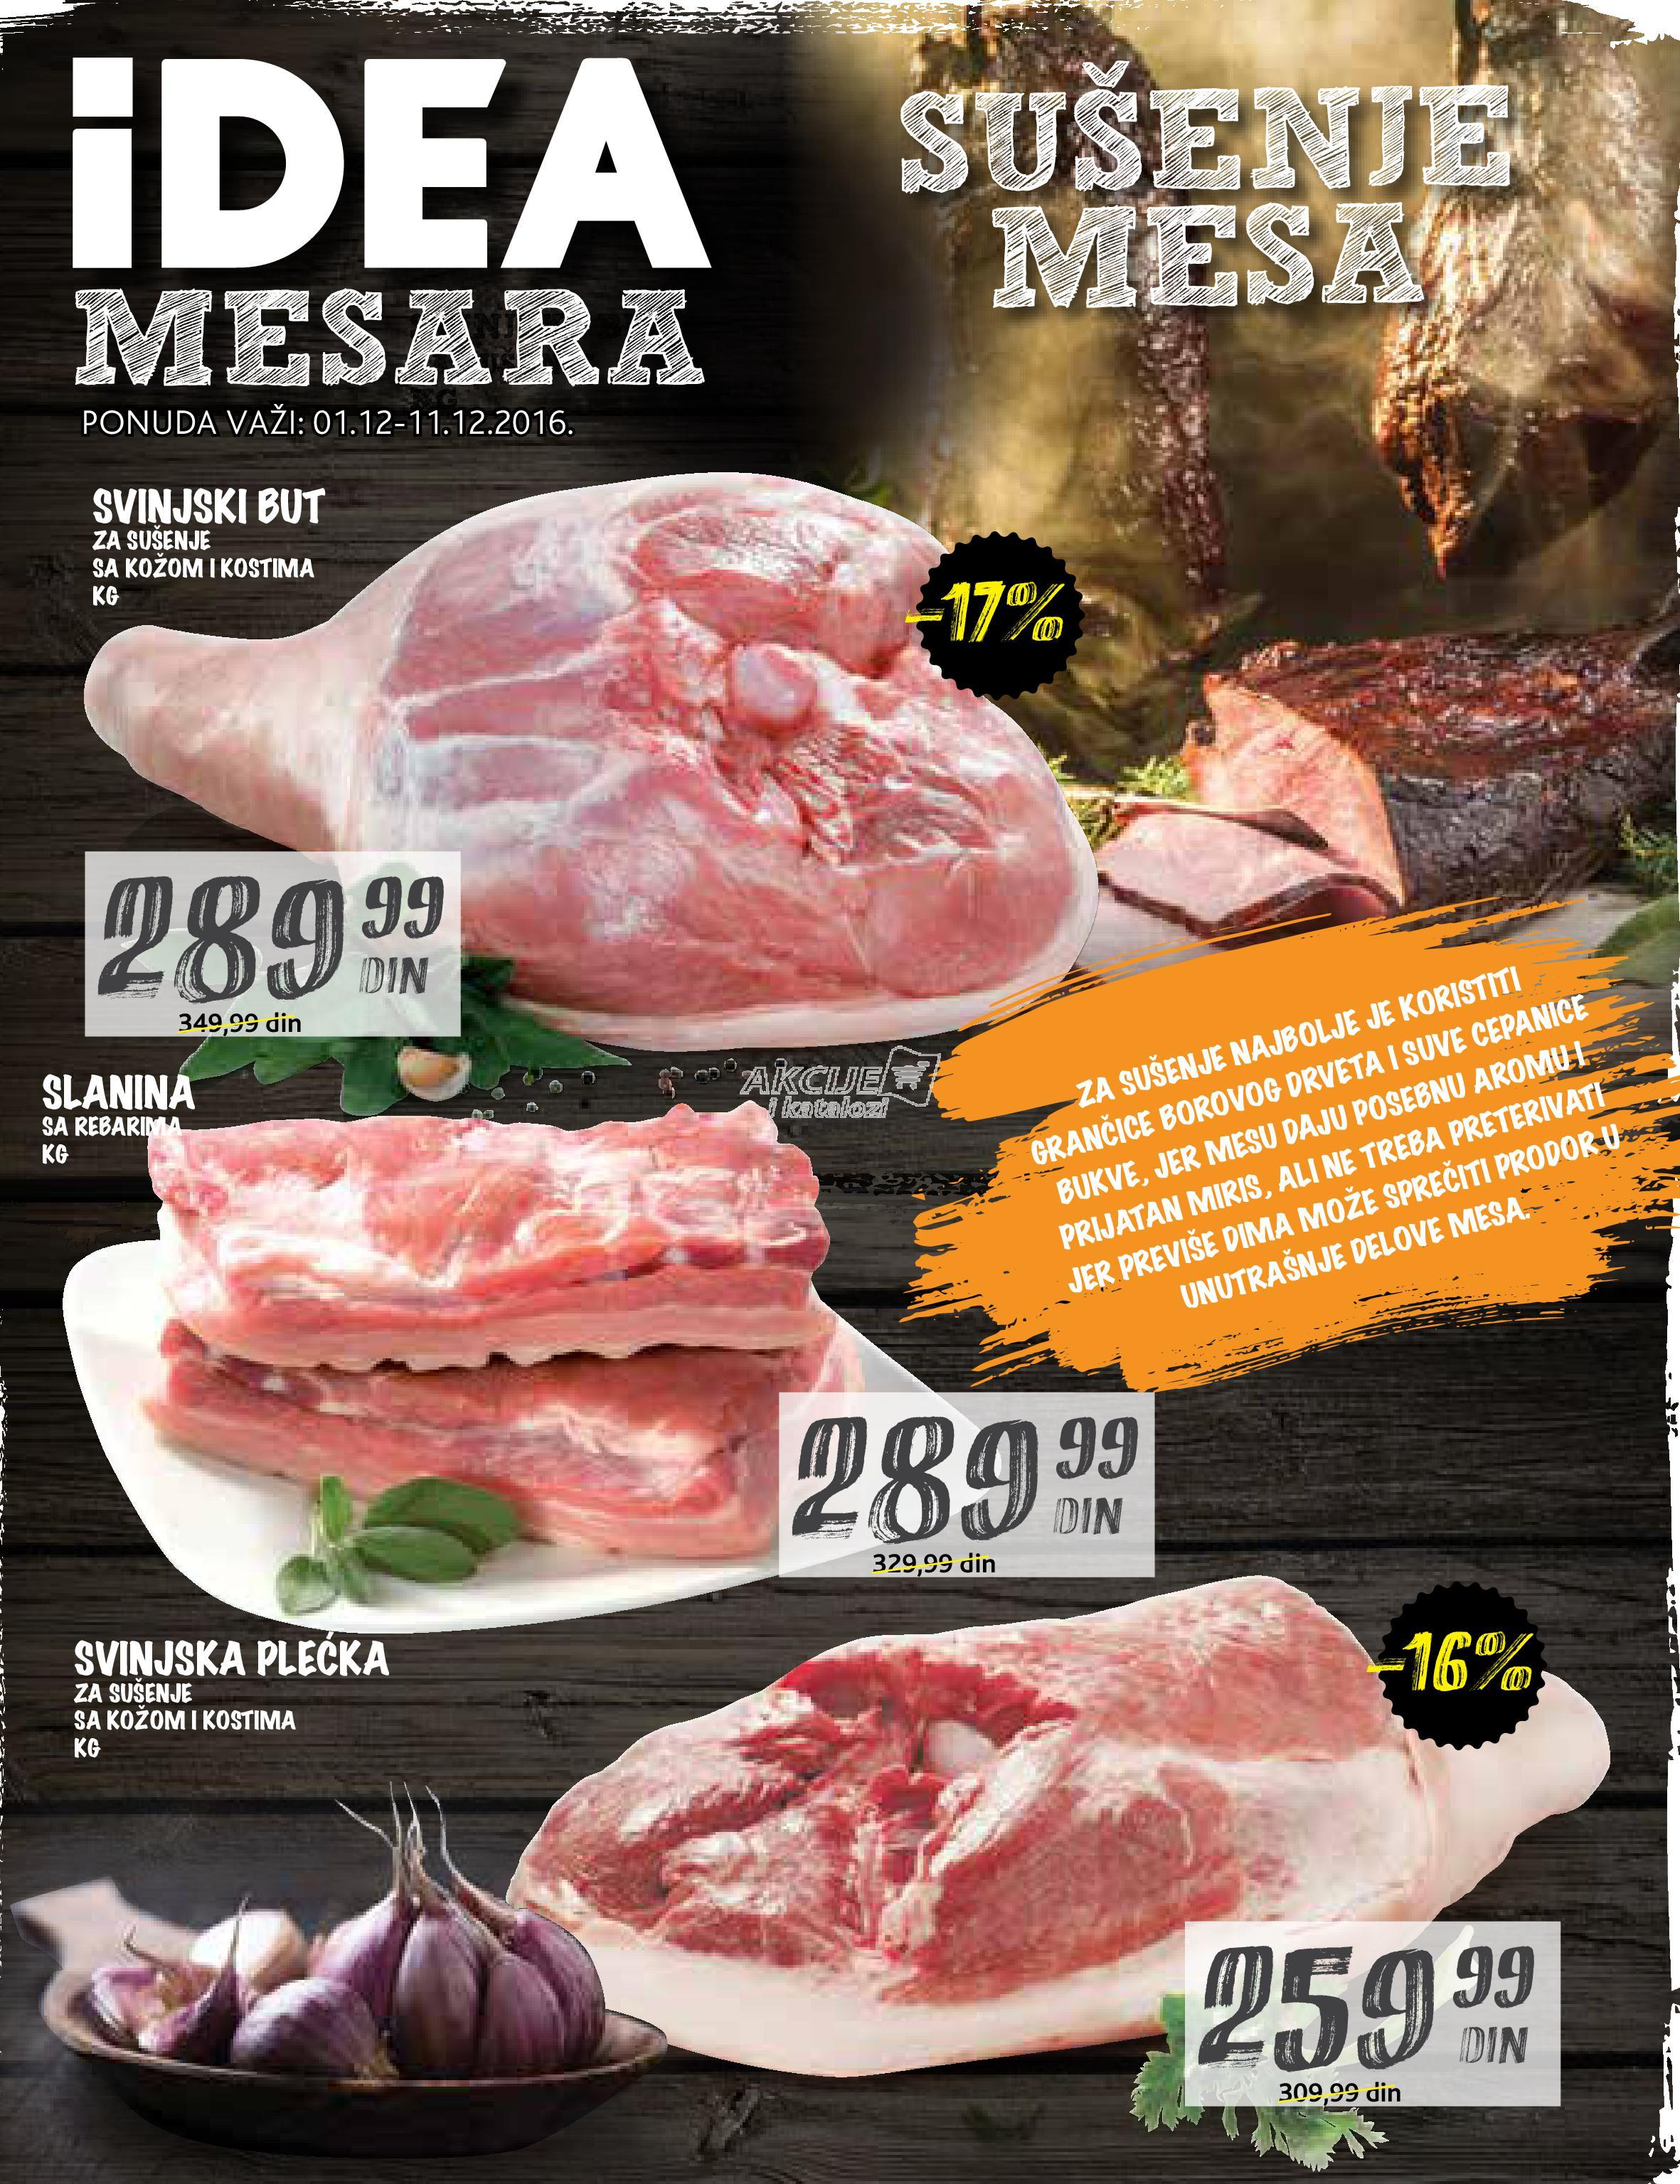 Idea - Redovna akcija mesara